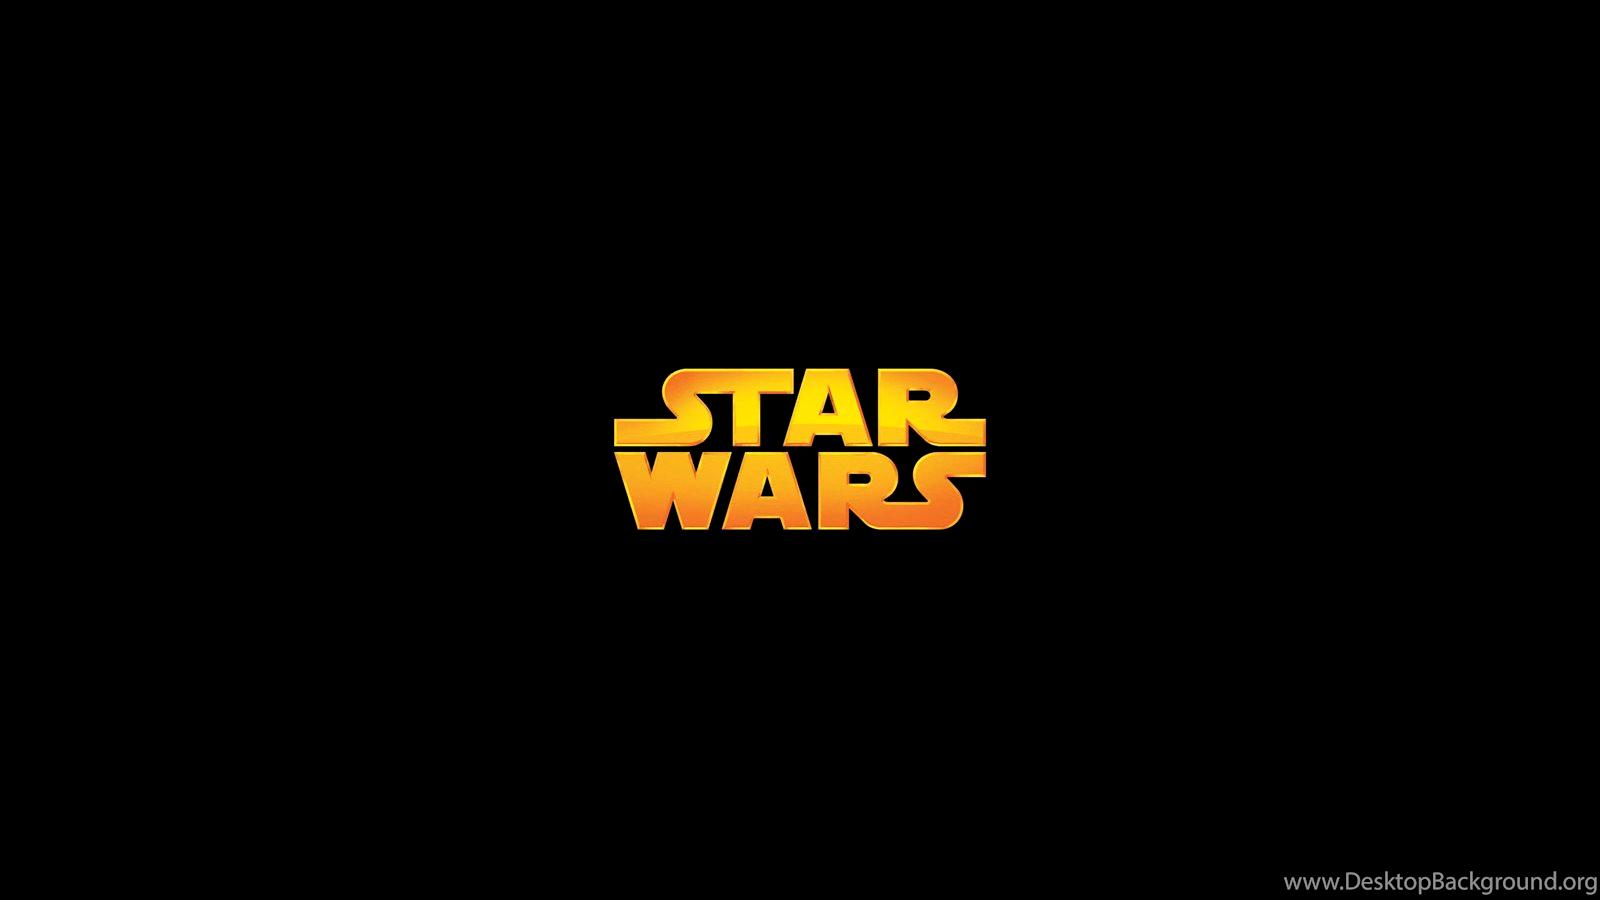 Star Wars Logo Wallpapers Wallpapers Cave Desktop Background